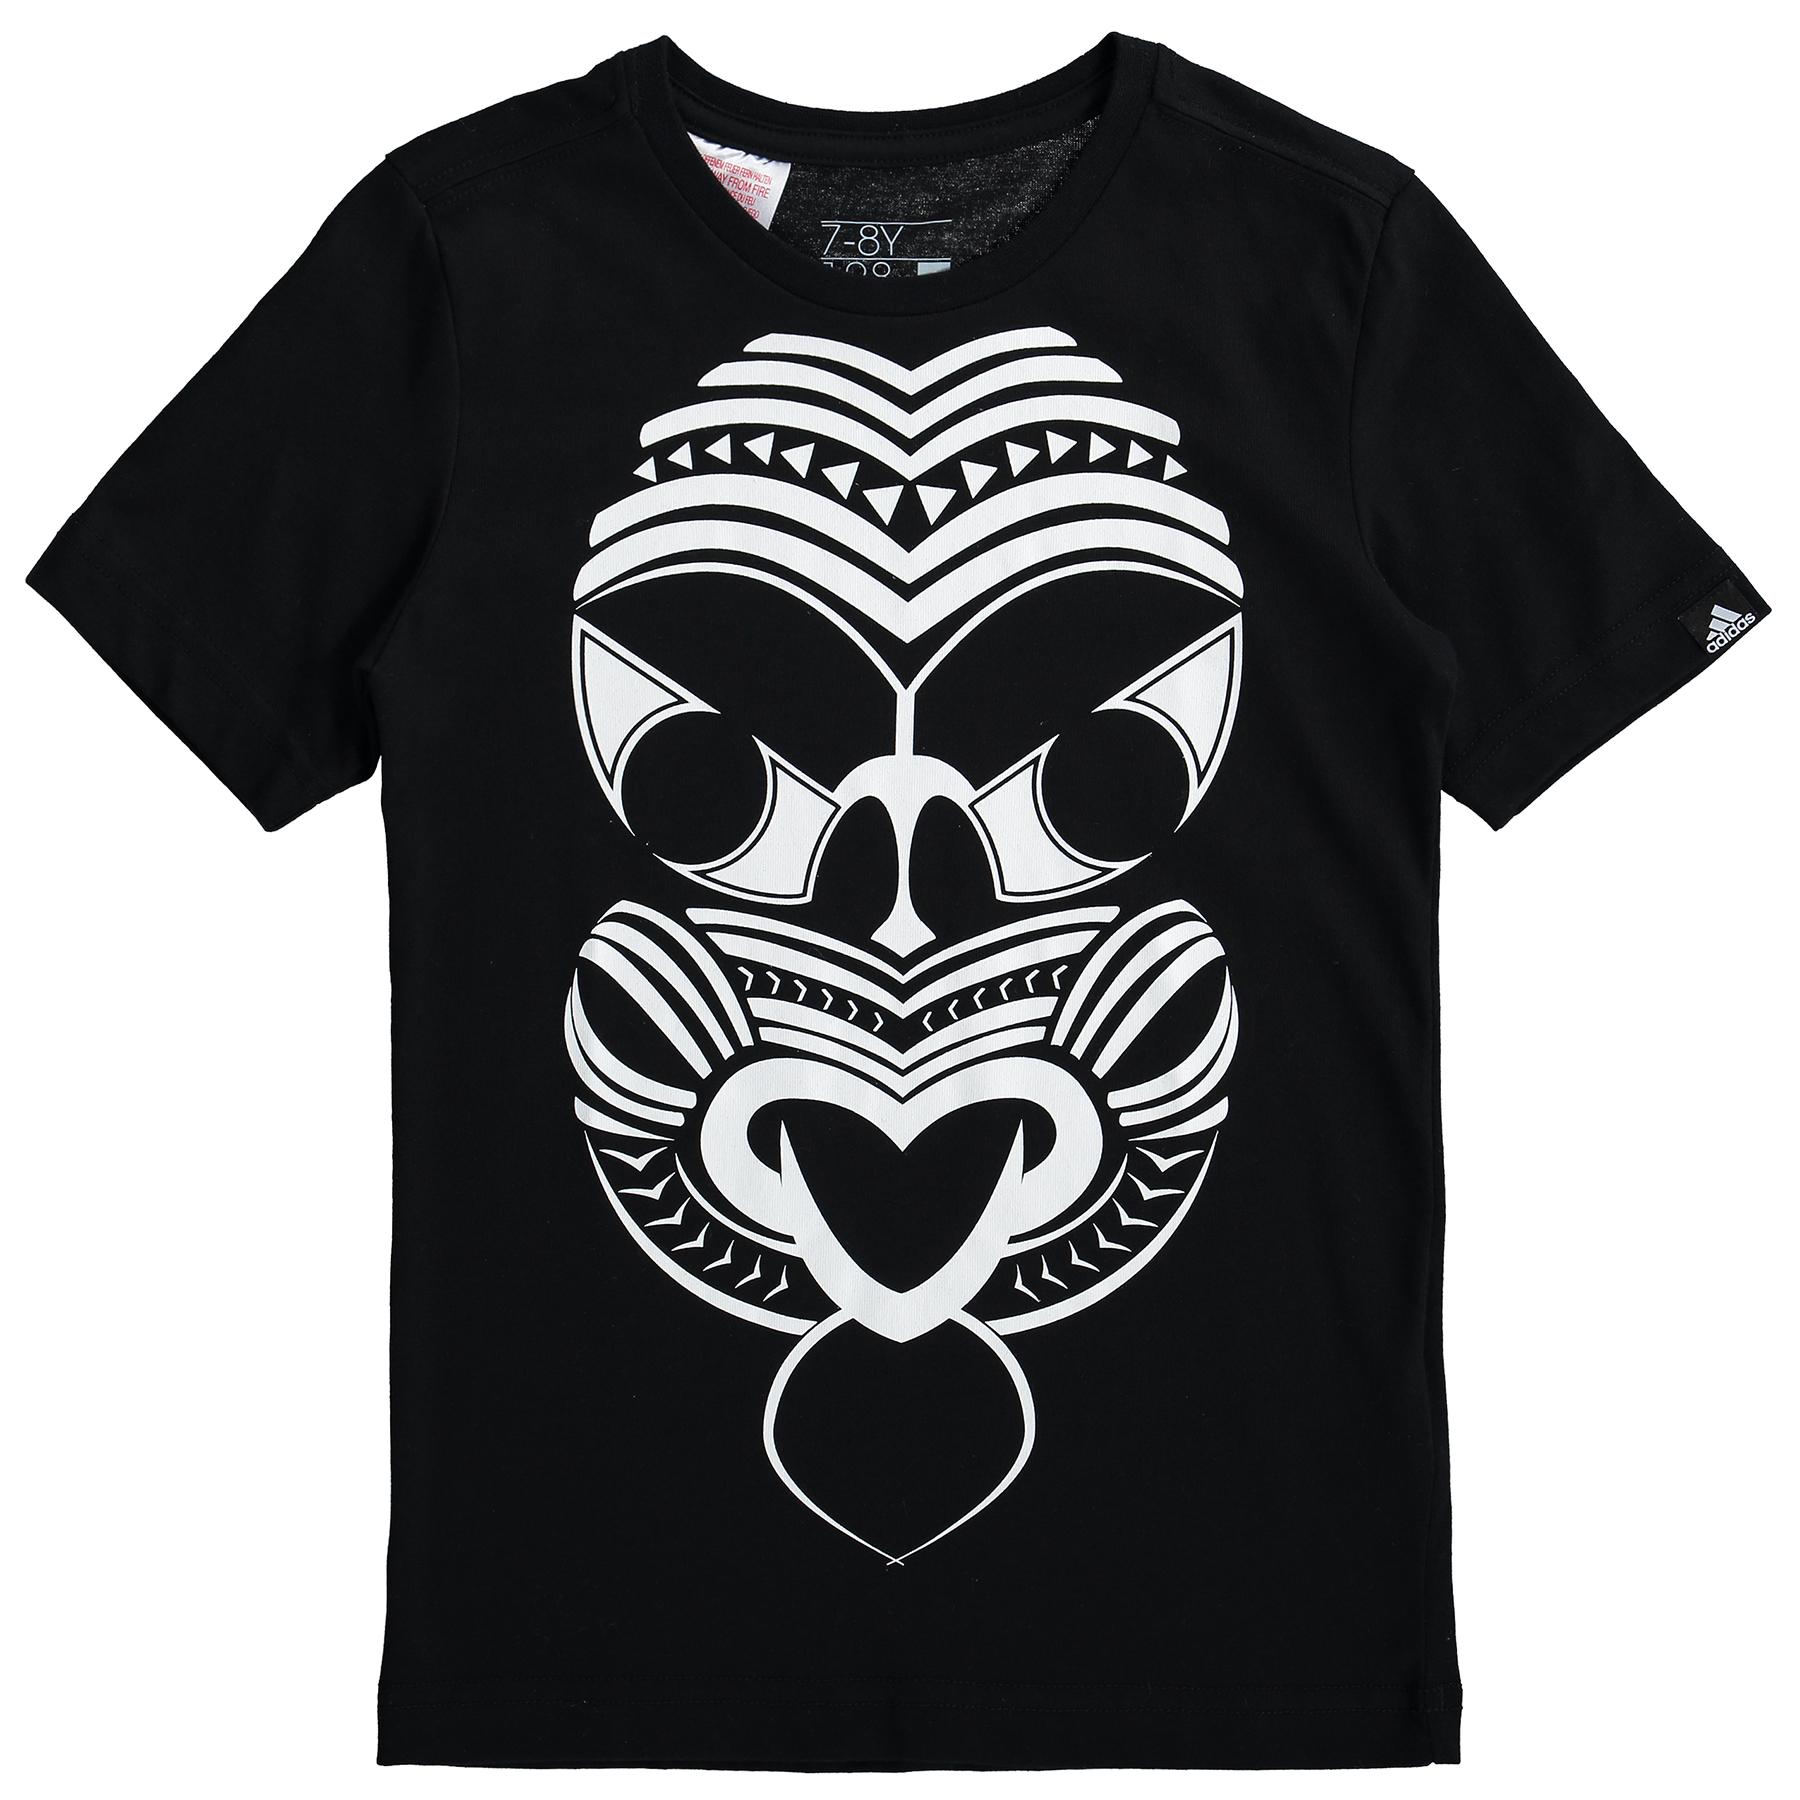 All Blacks Rugby Mask T-Shirt - Kids Black